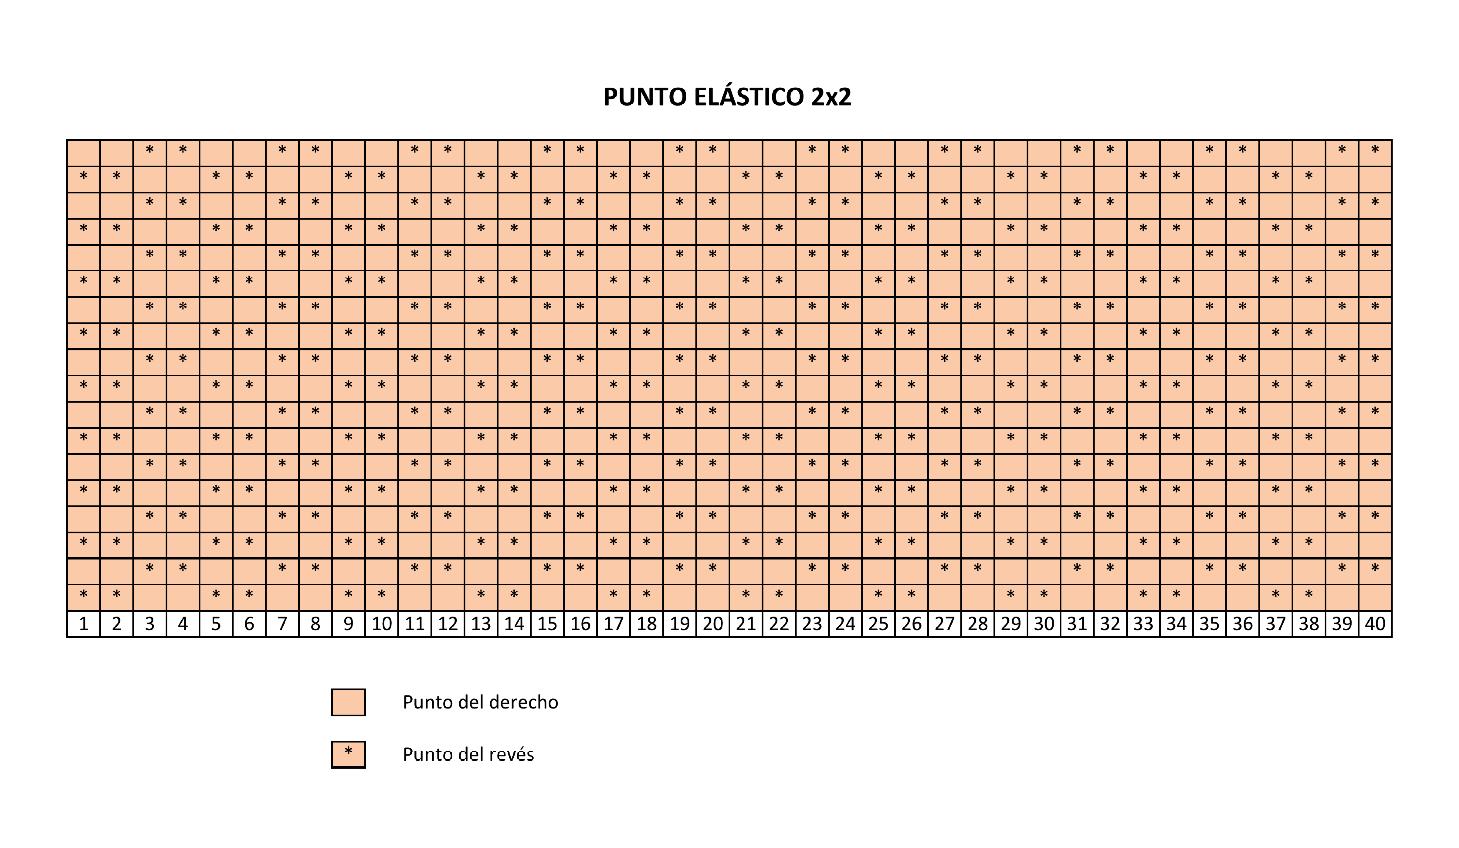 Curso APRENDER A TEJER CON DOS AGUJAS (Cap 10) Punto elástico 2x2 ó doble